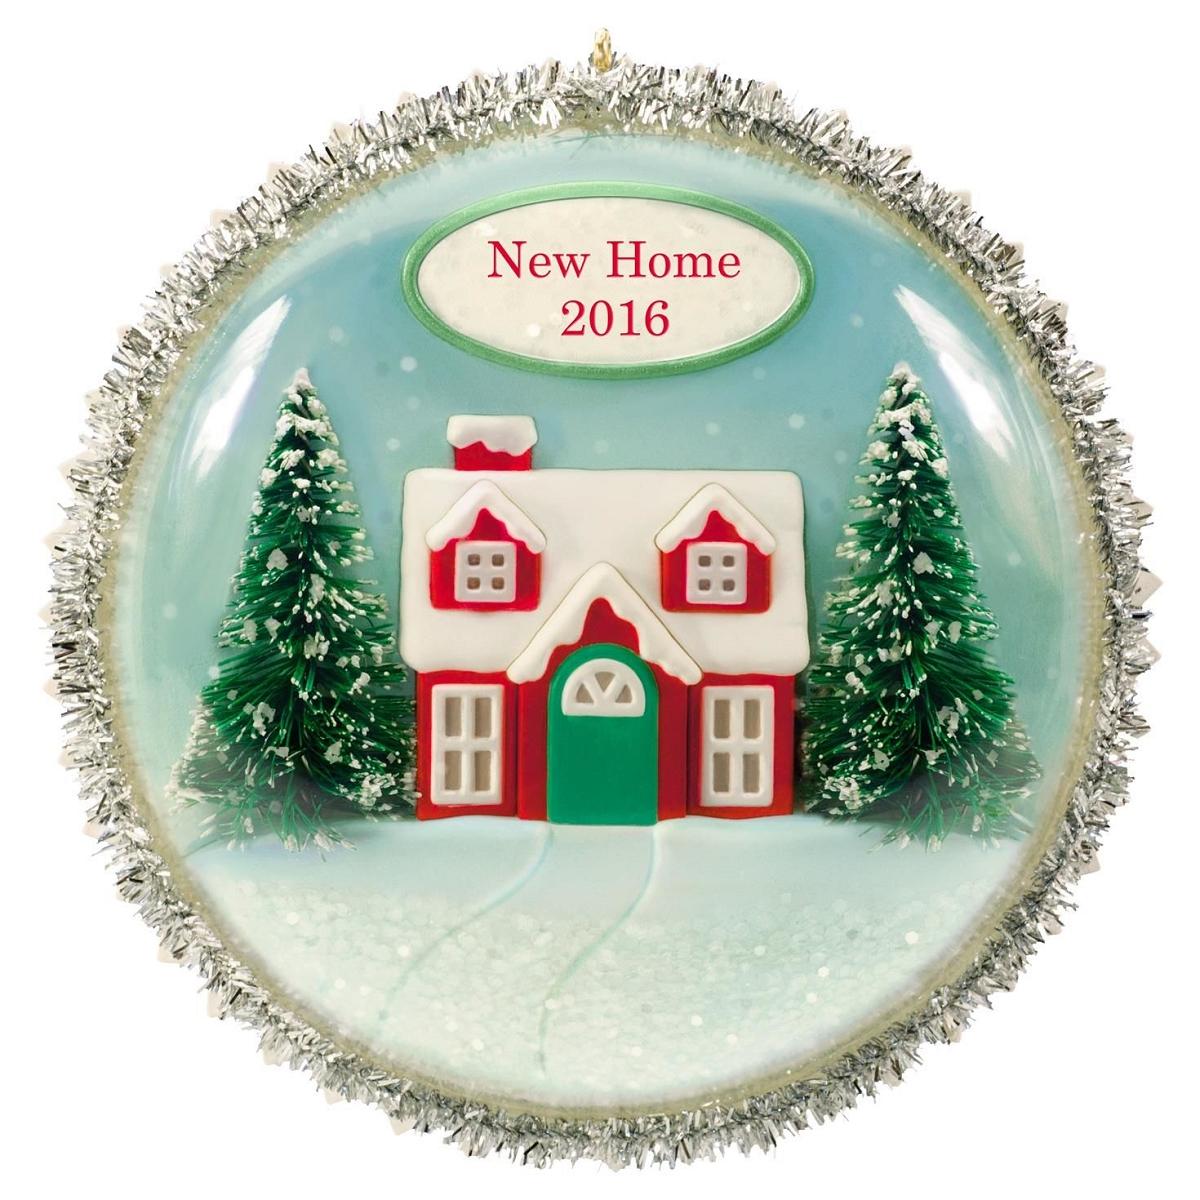 2016 New Home Hallmark Keepsake Ornament